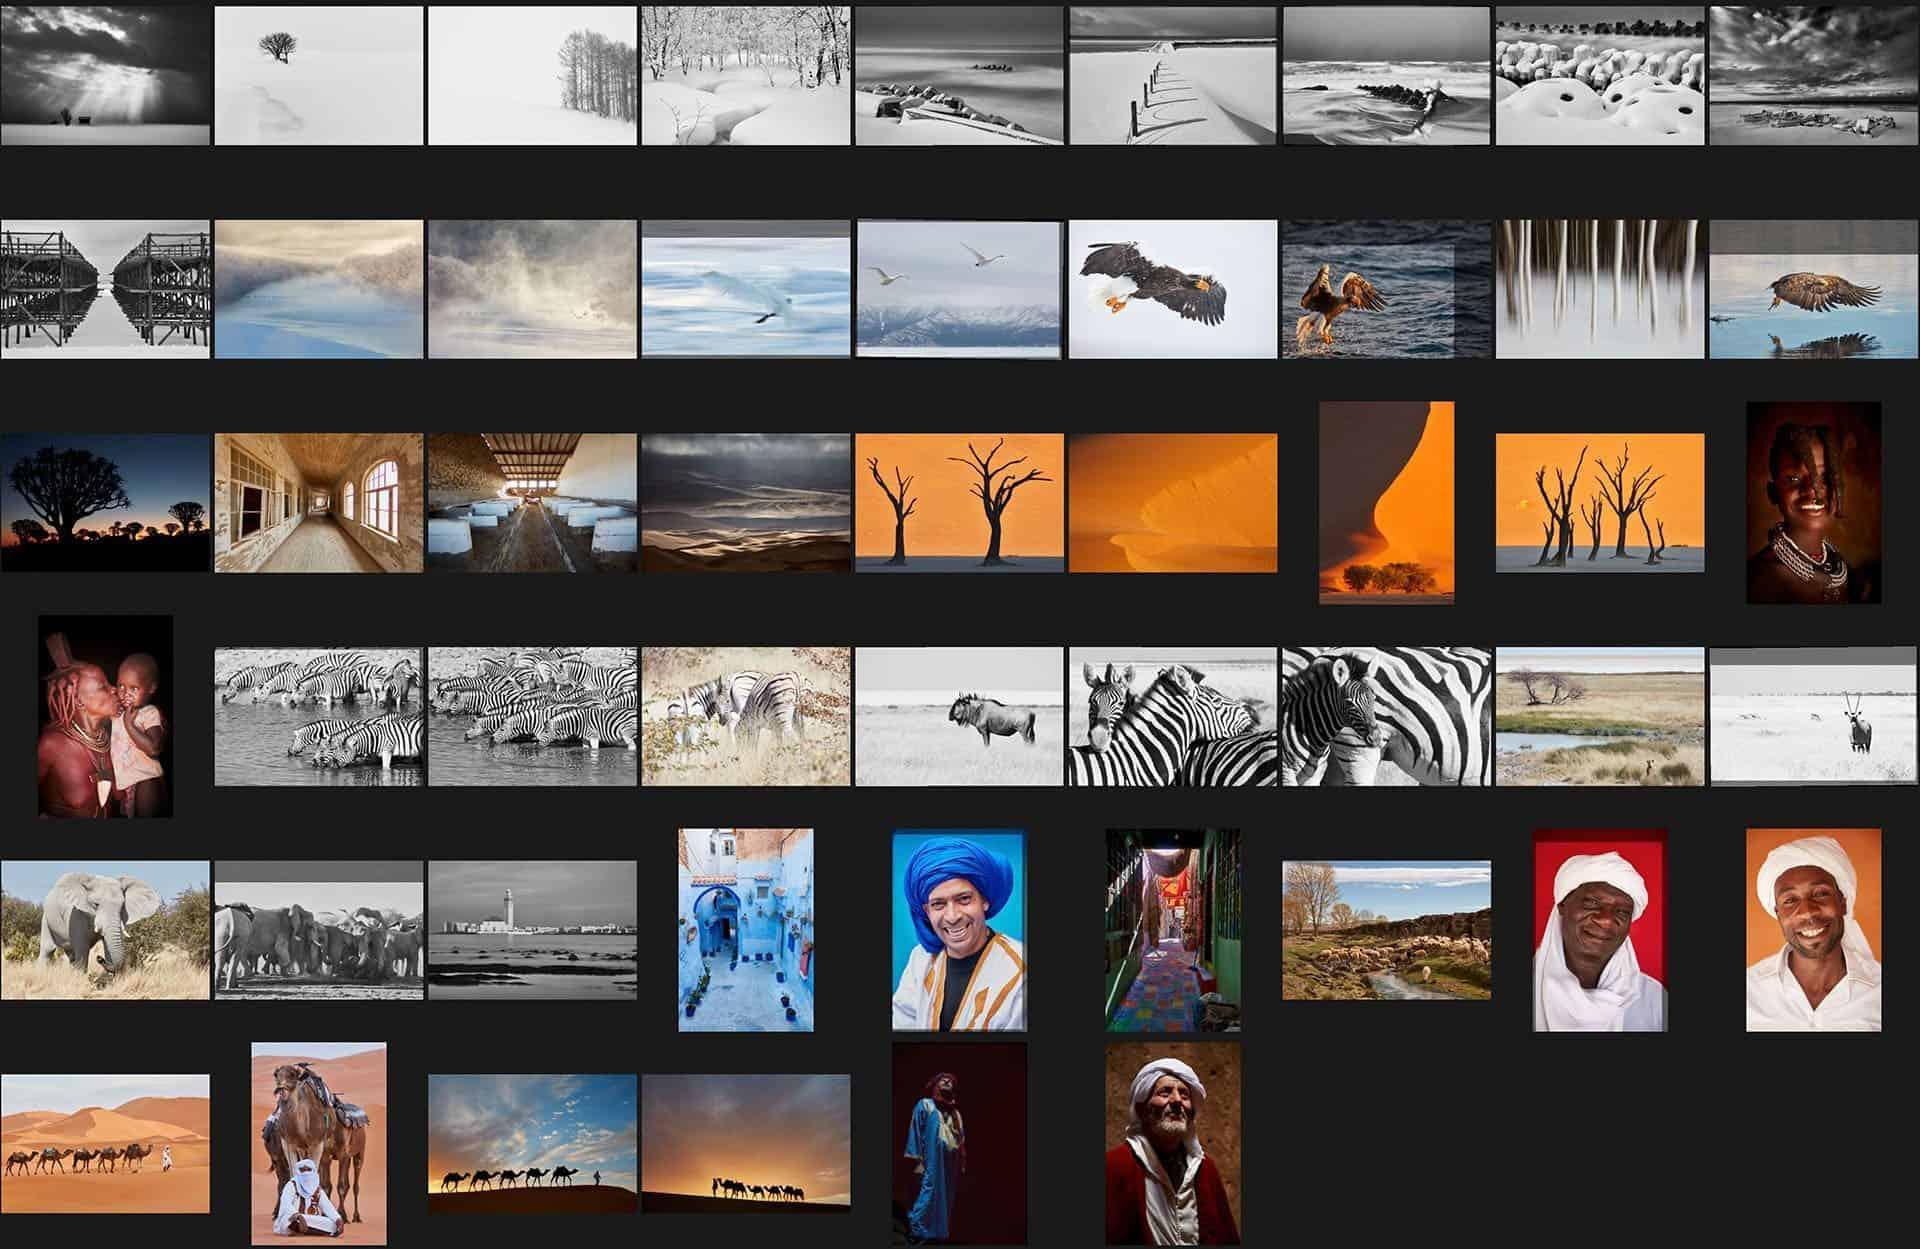 2017 Top Ten Photographs Selection Process Podcast 602 Martin